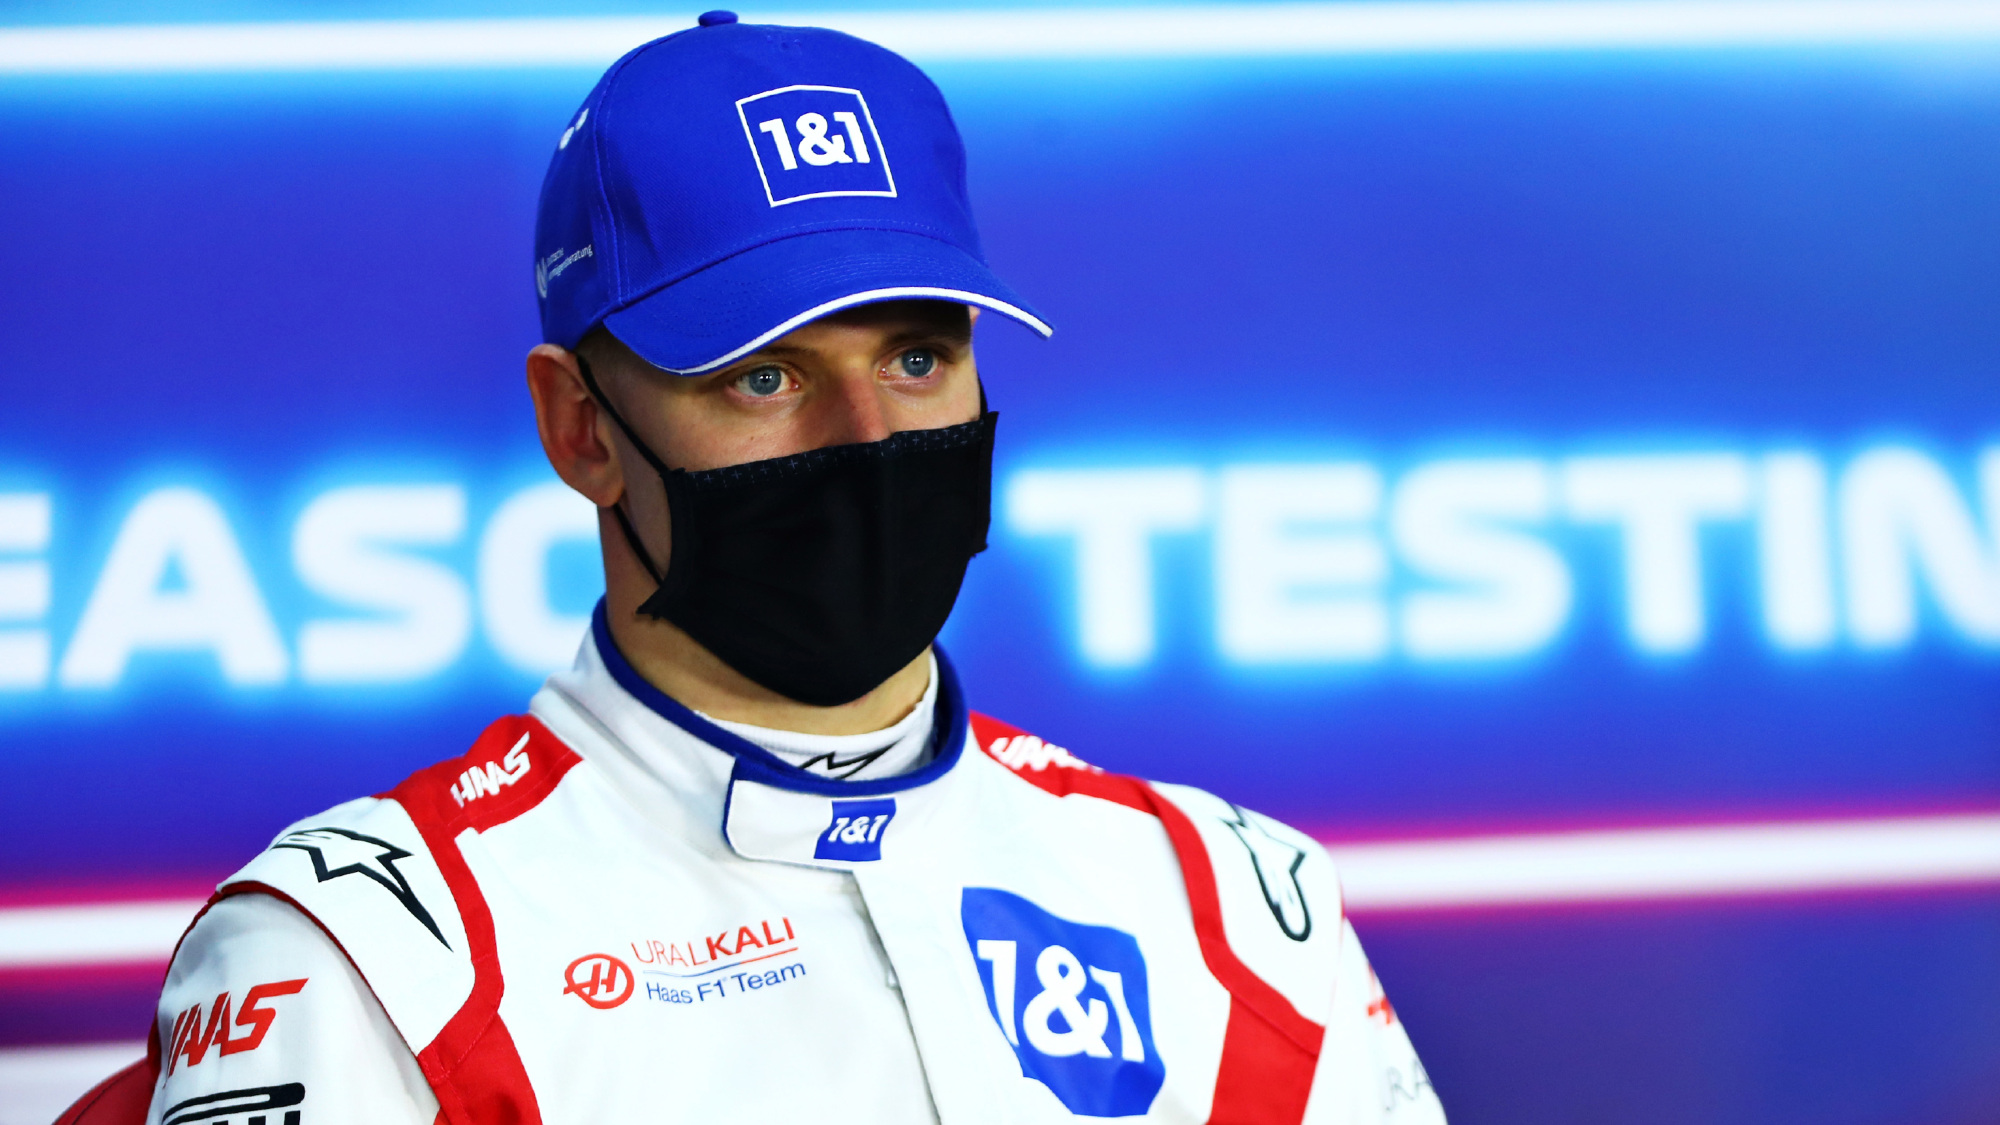 Mick Schumacher, 2021 Testing